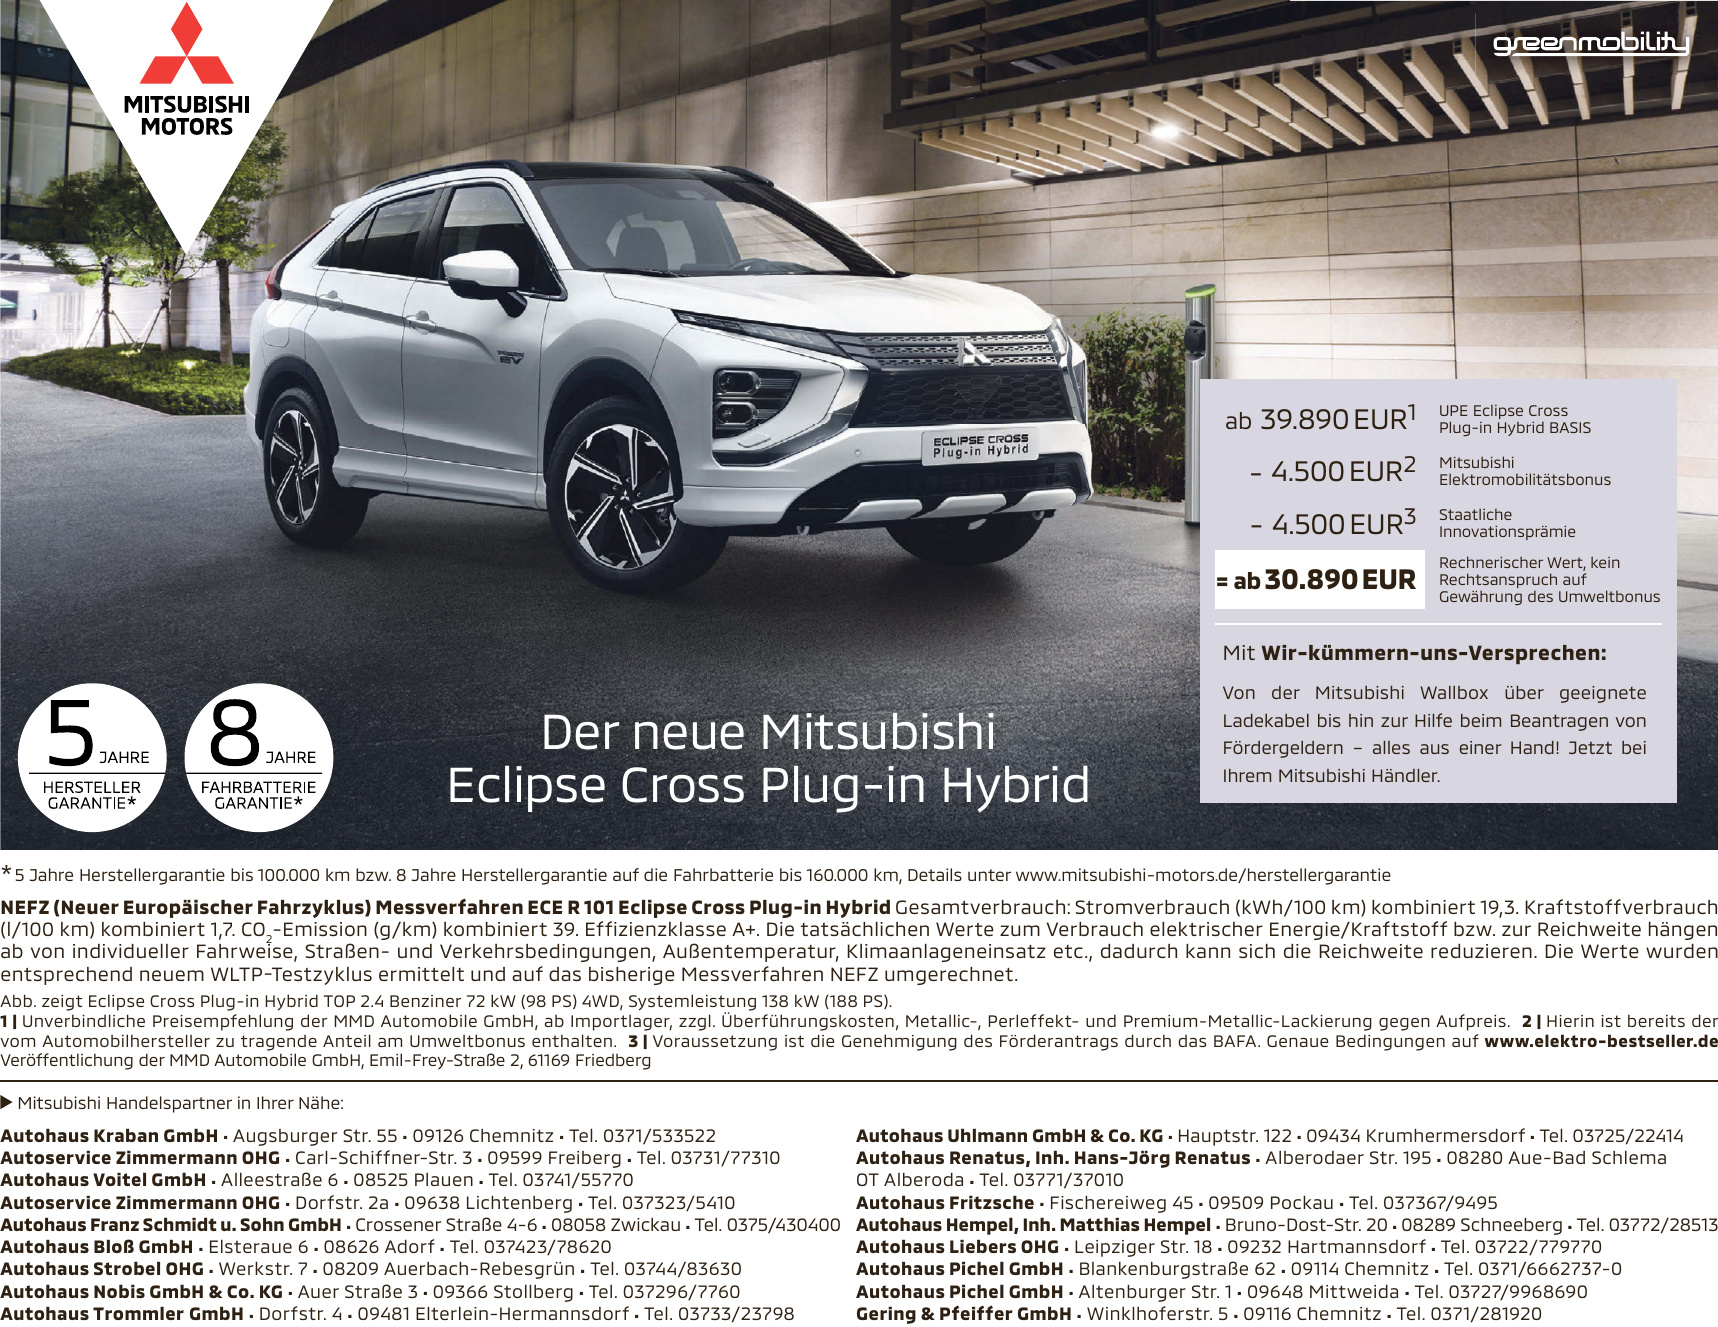 Autohaus Kraban GmbH